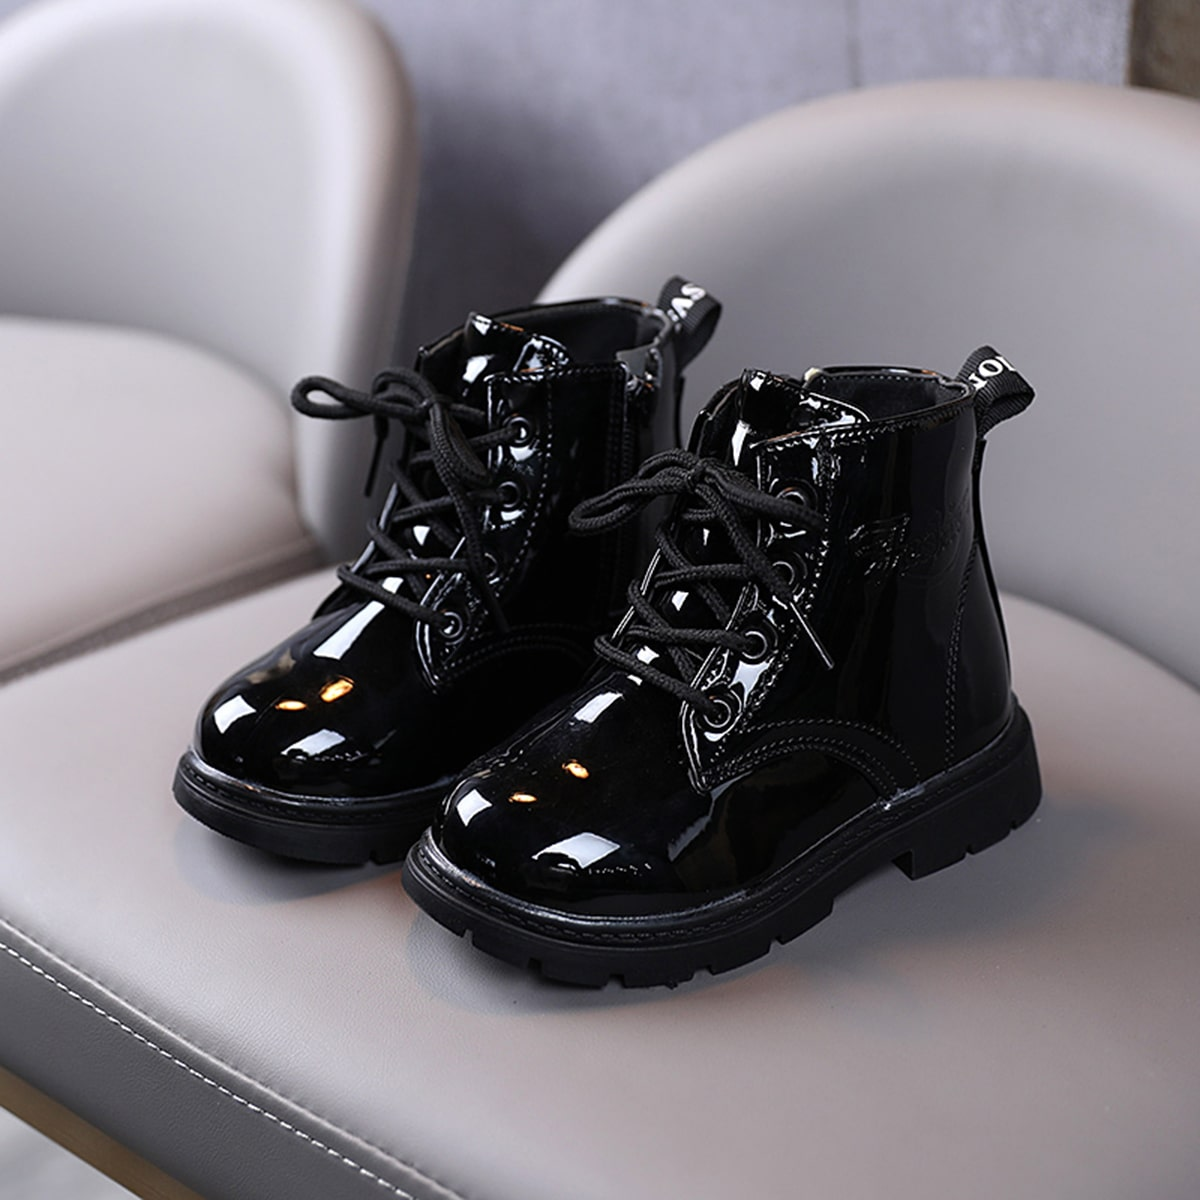 Ботинки на шнурках для девочек SheIn skshoes03201118150